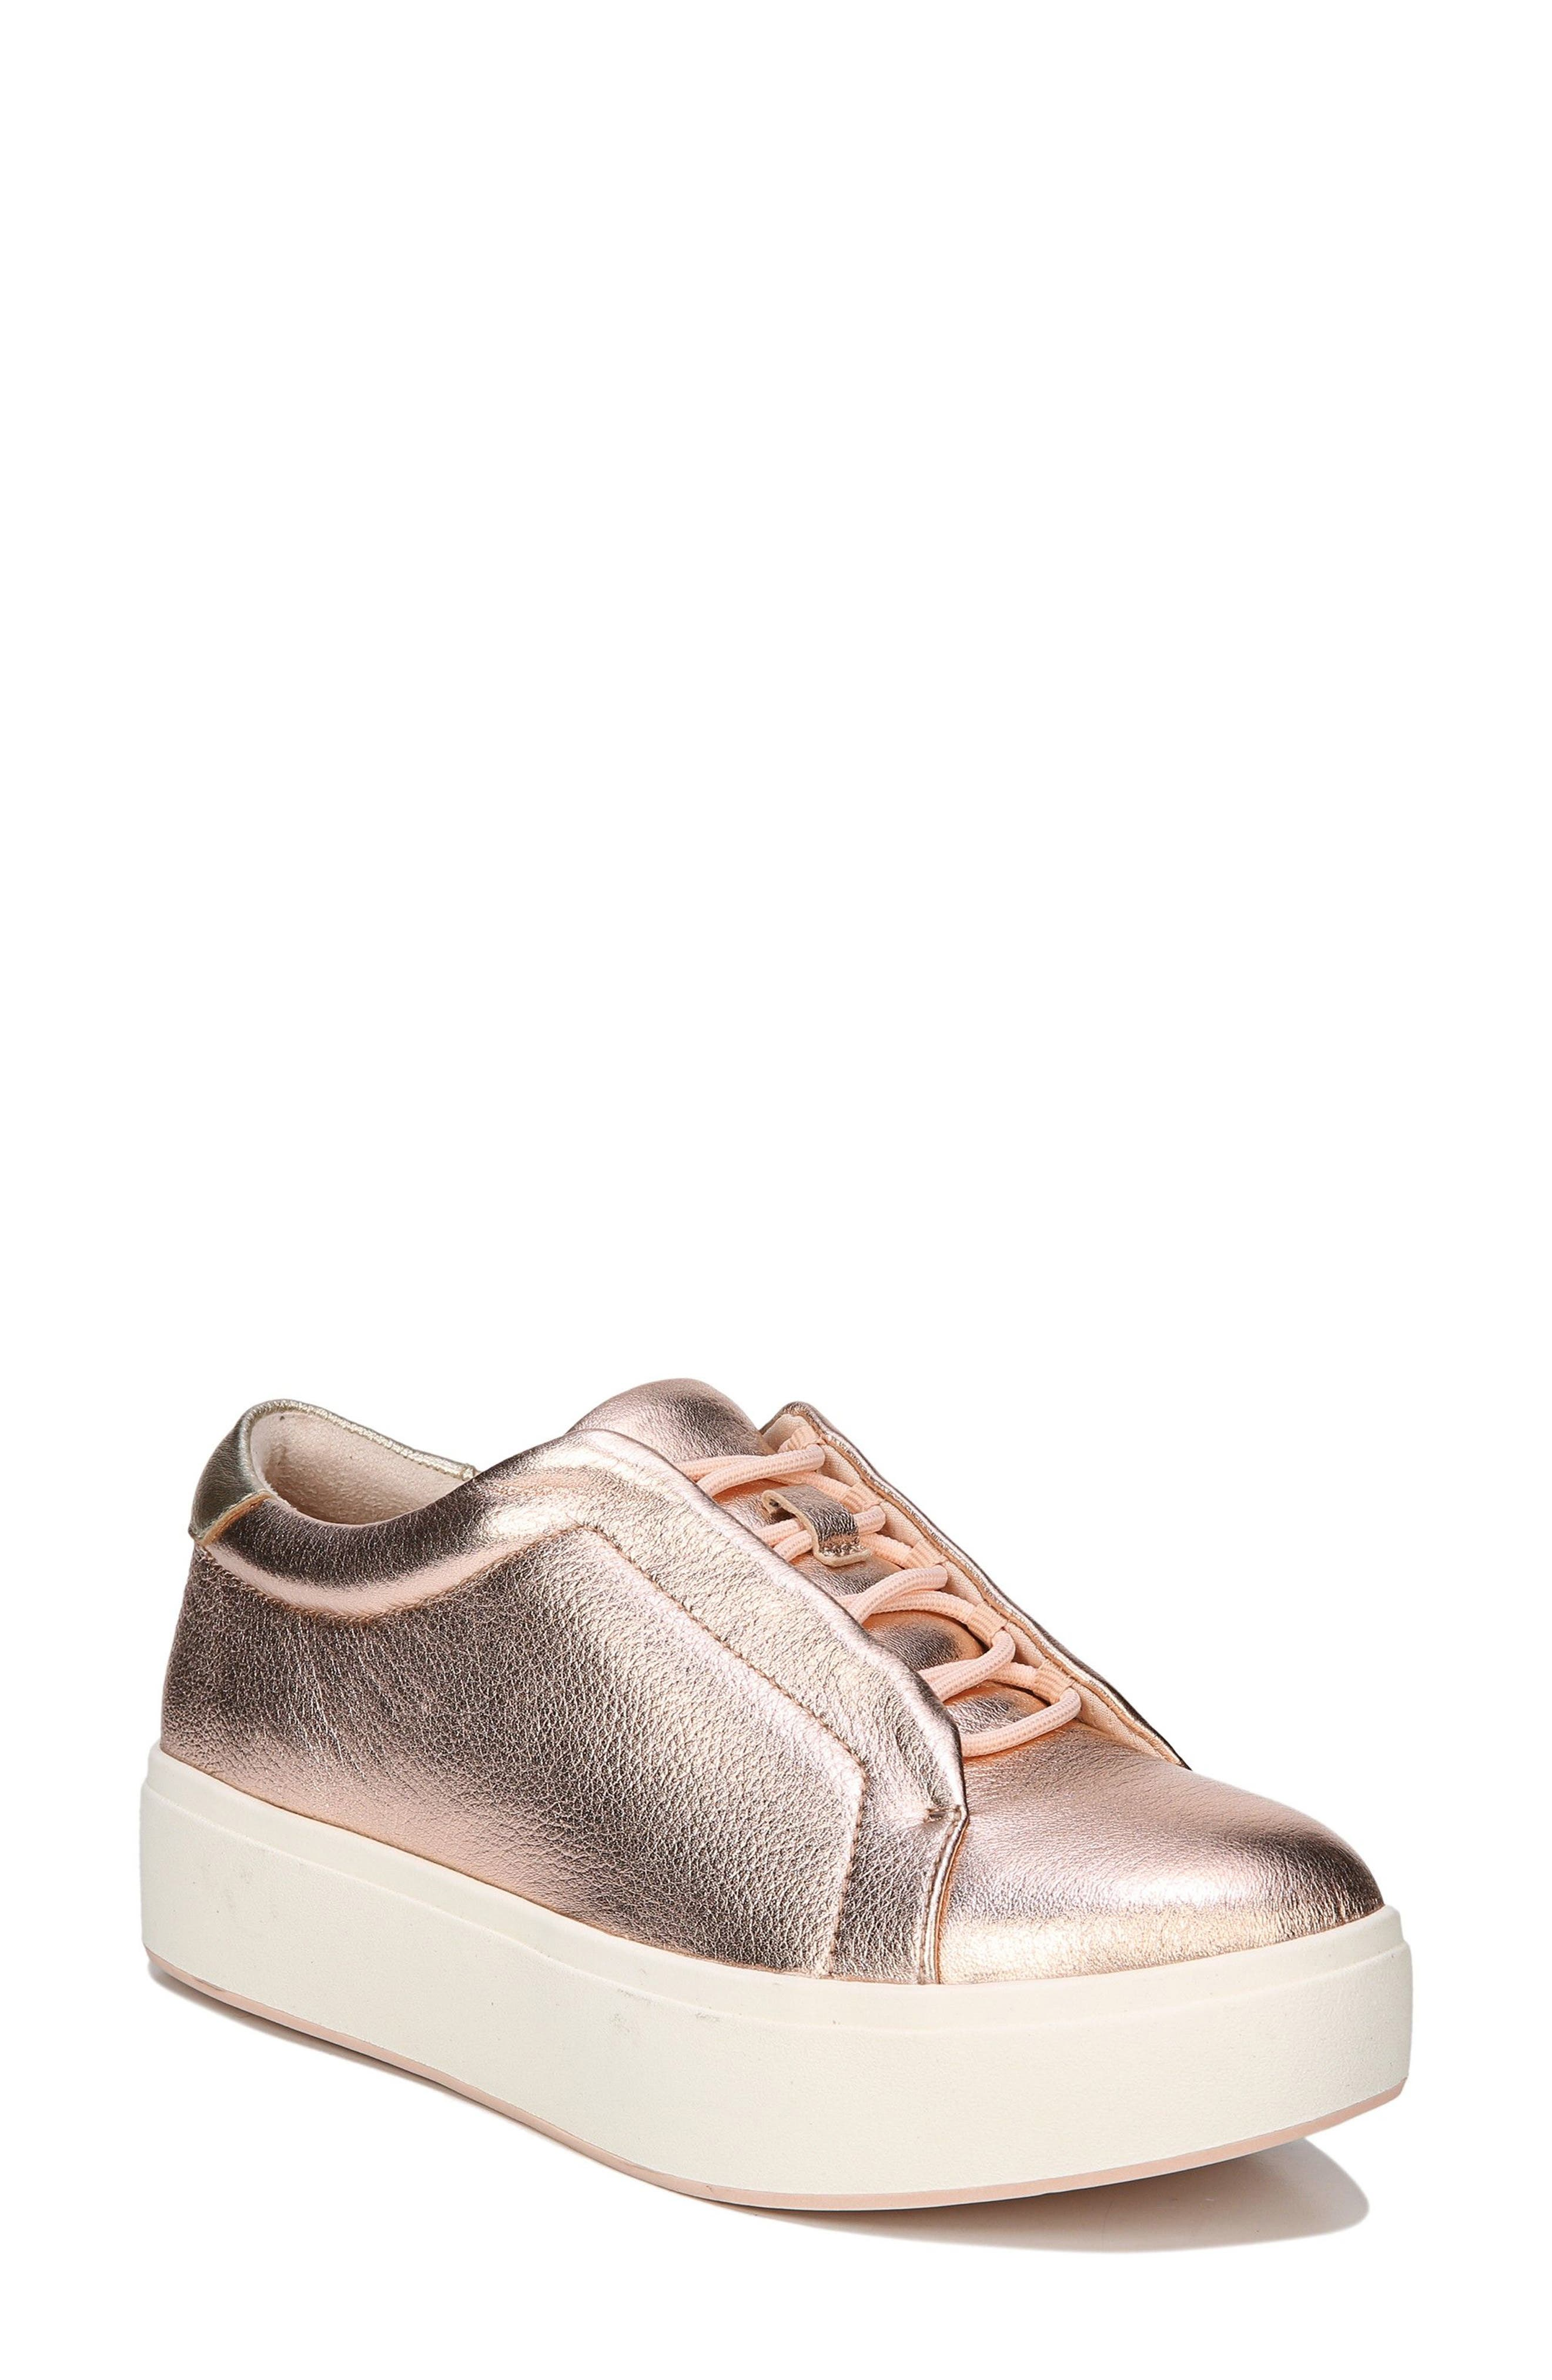 Abbot Sneaker,                         Main,                         color, Primrose Leather